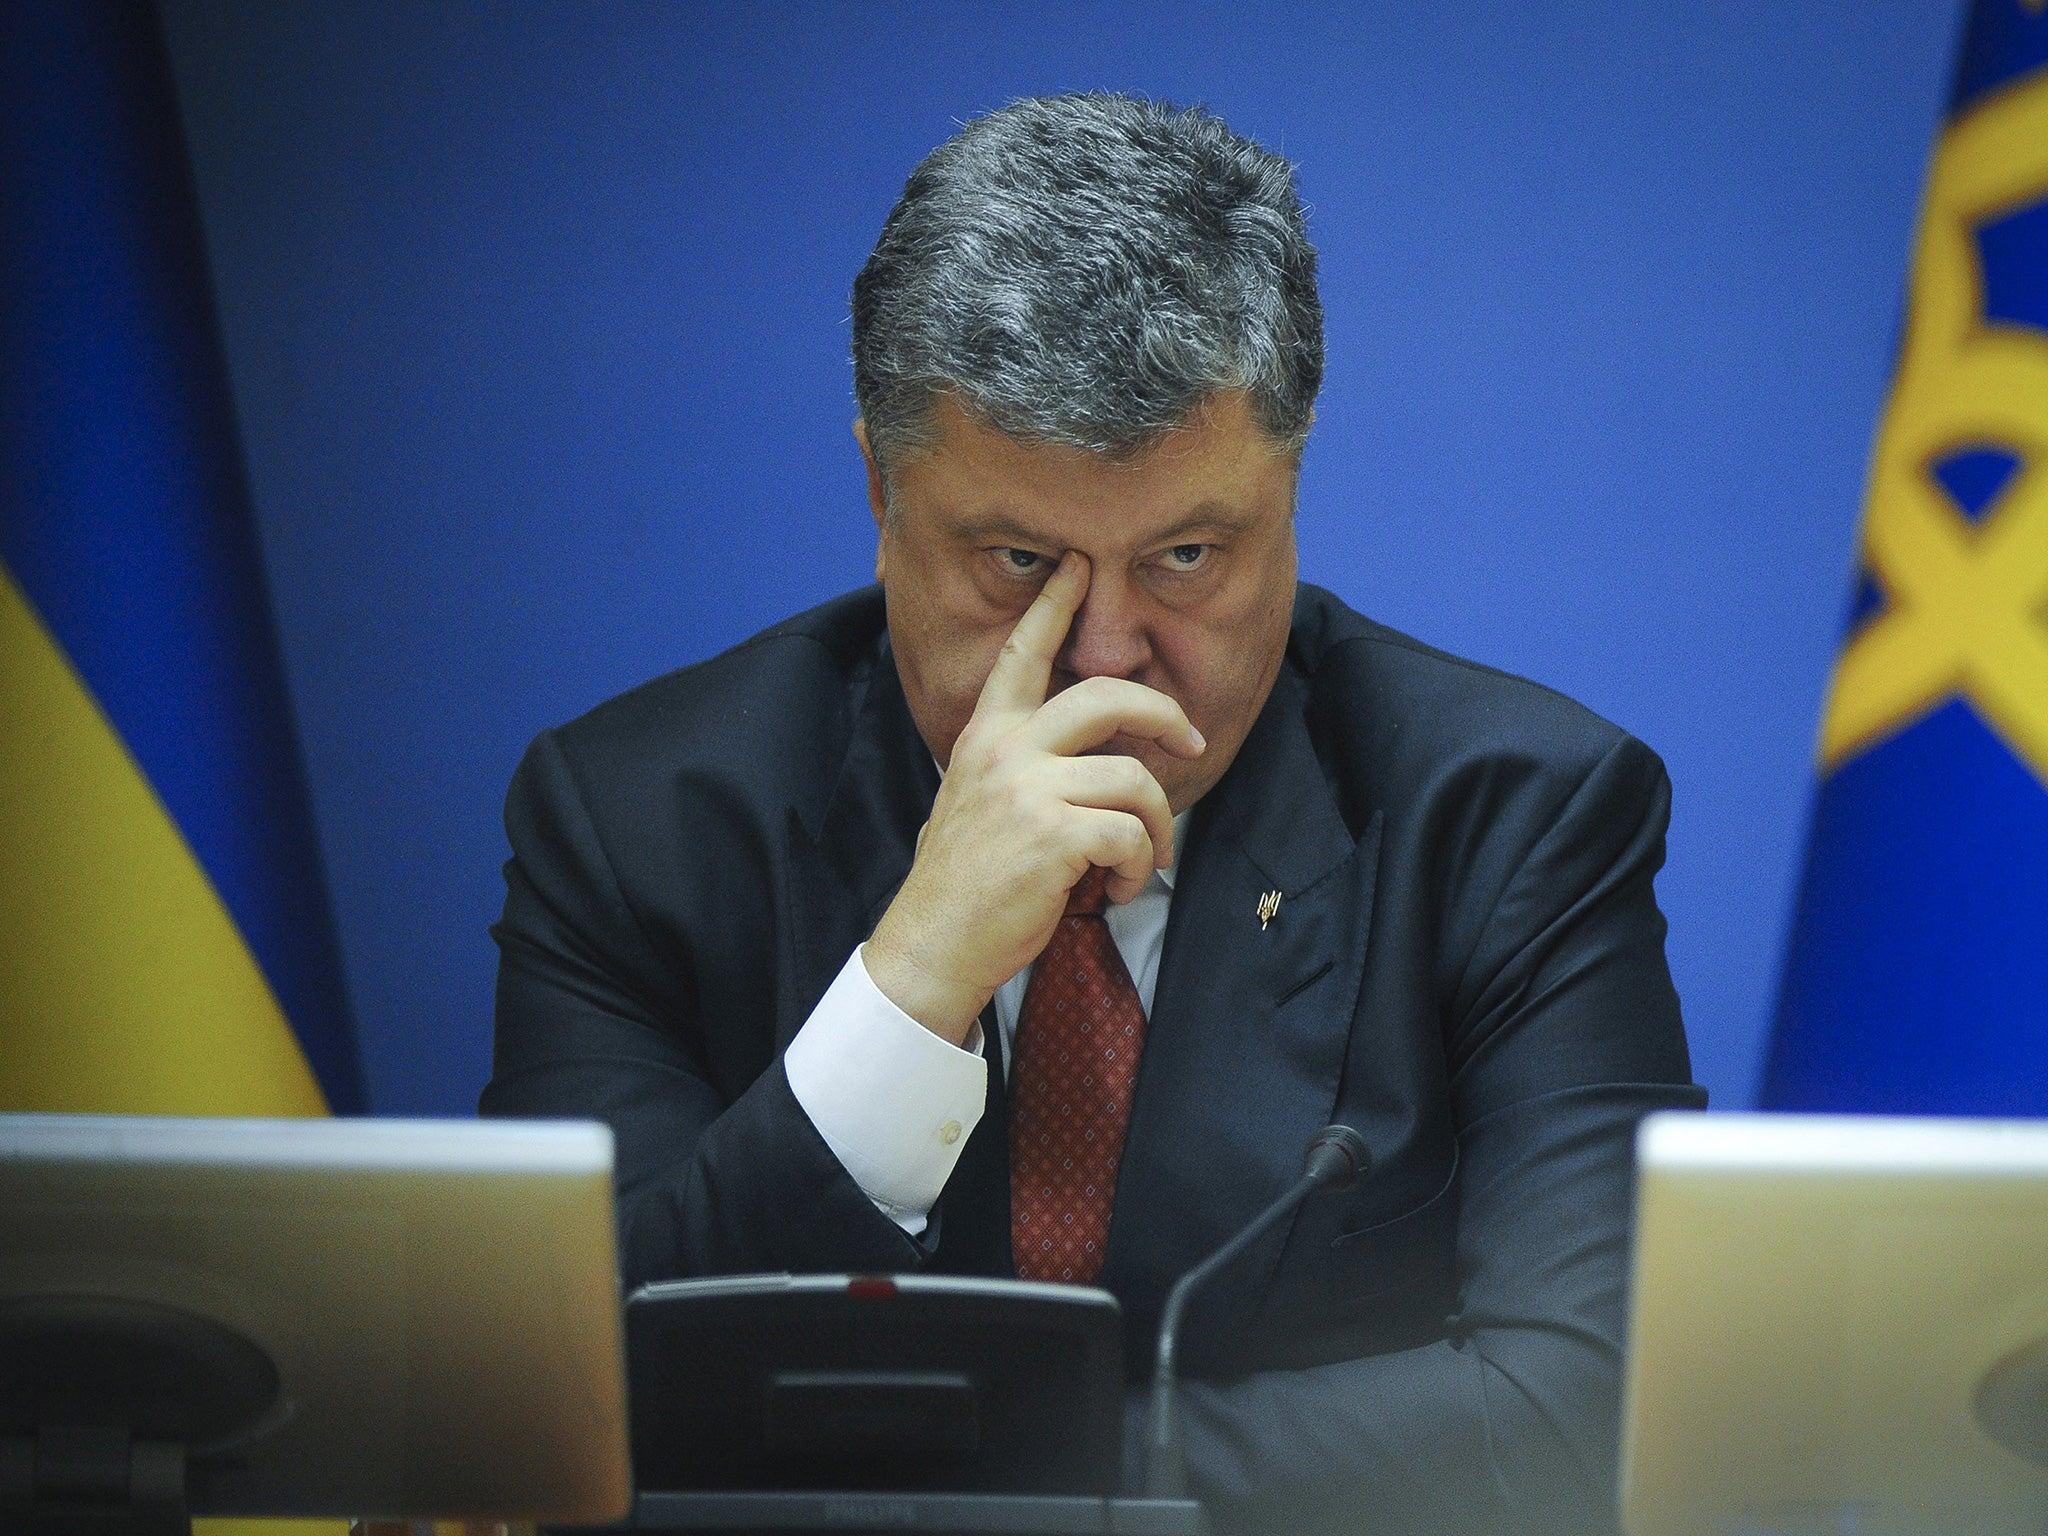 Poroshenko said that the snipers on the Maidan led Surkov 02/20/2015 69